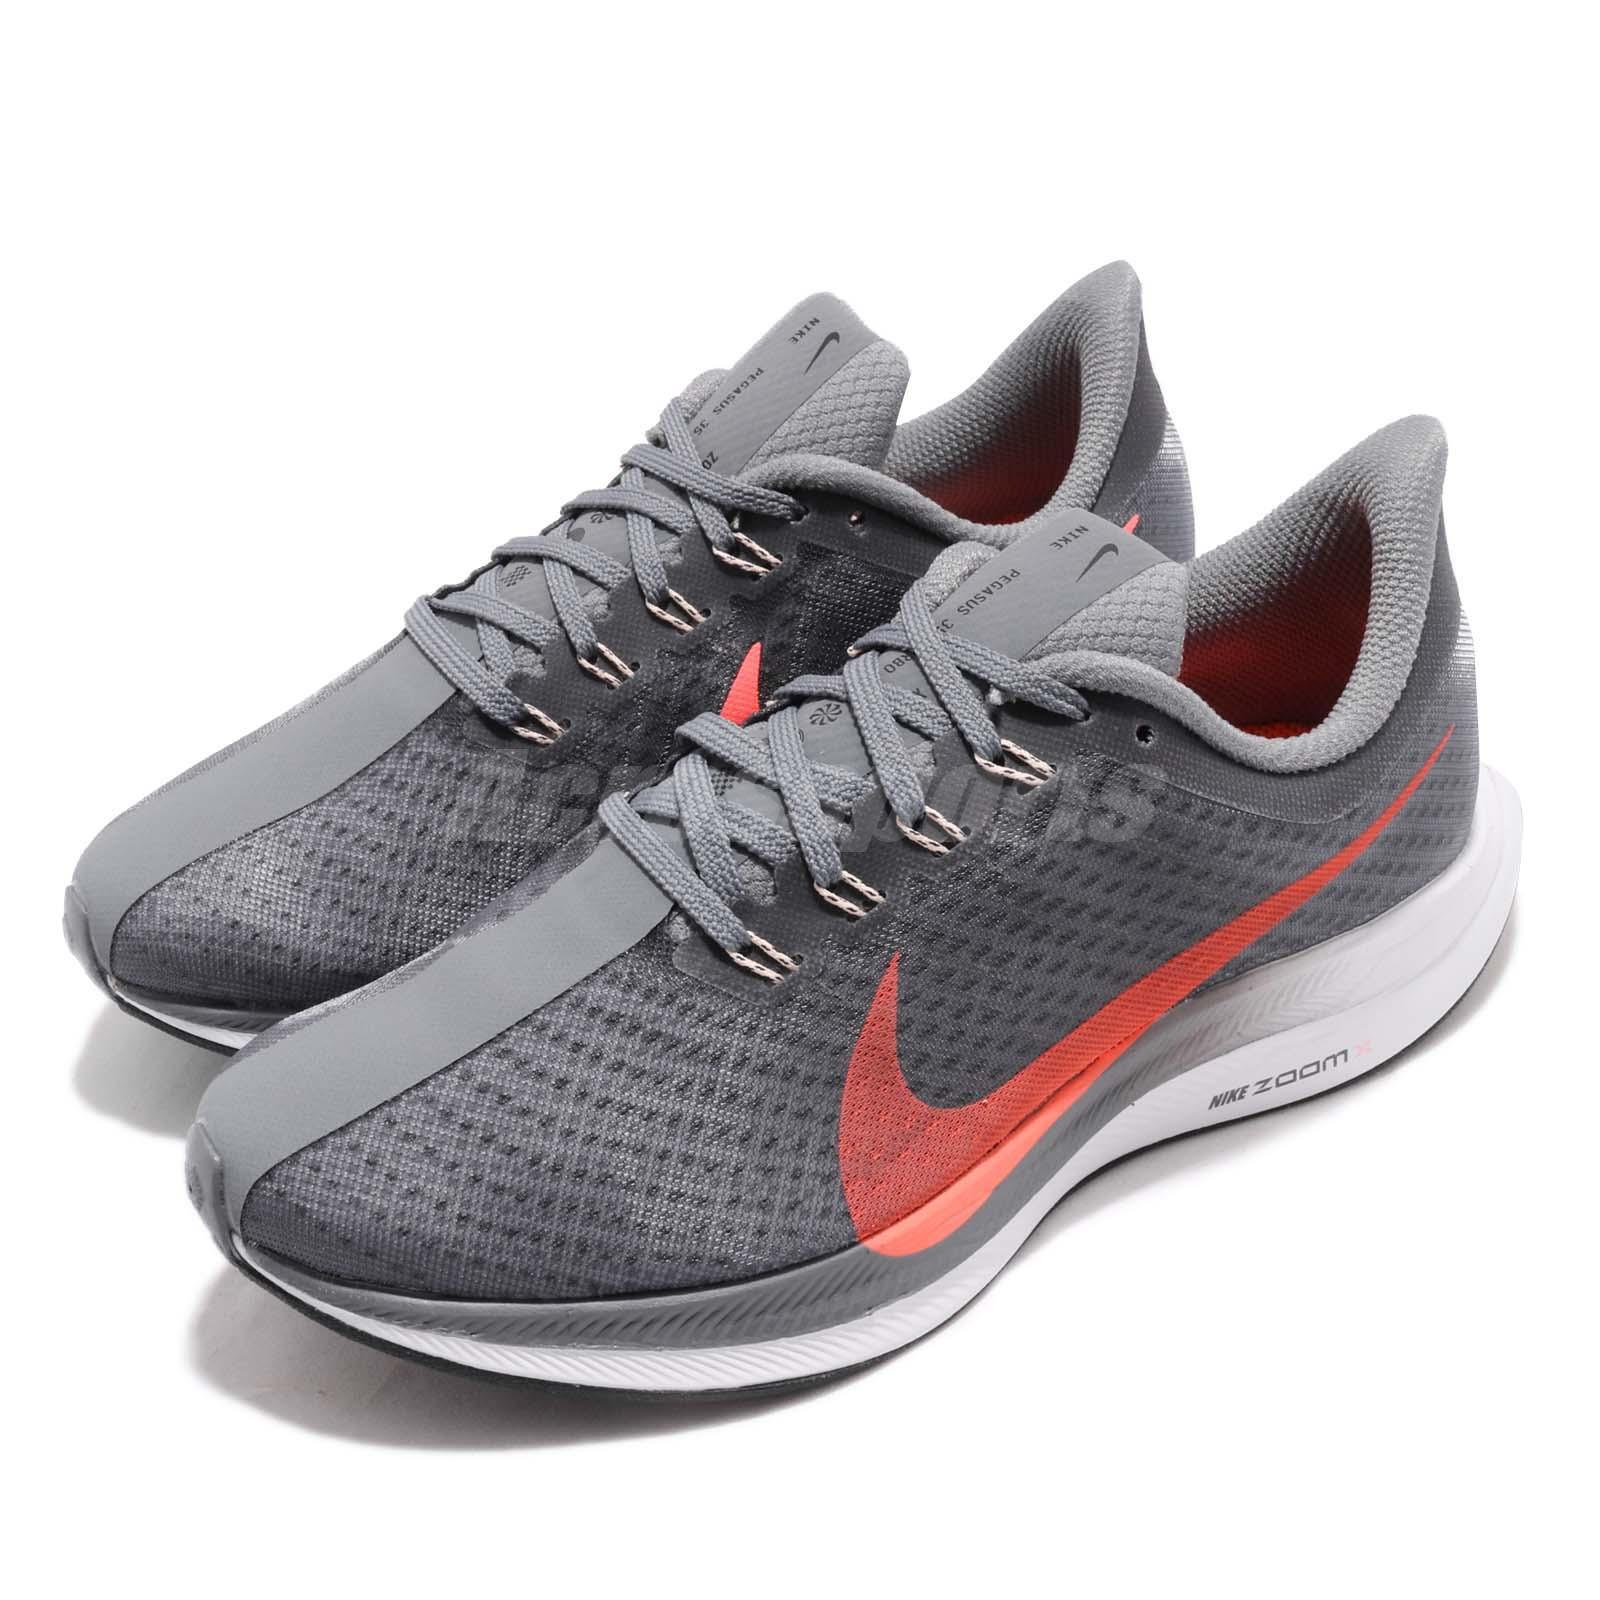 Nike Wmns Zoom Pegasus 35 Turbo Grey